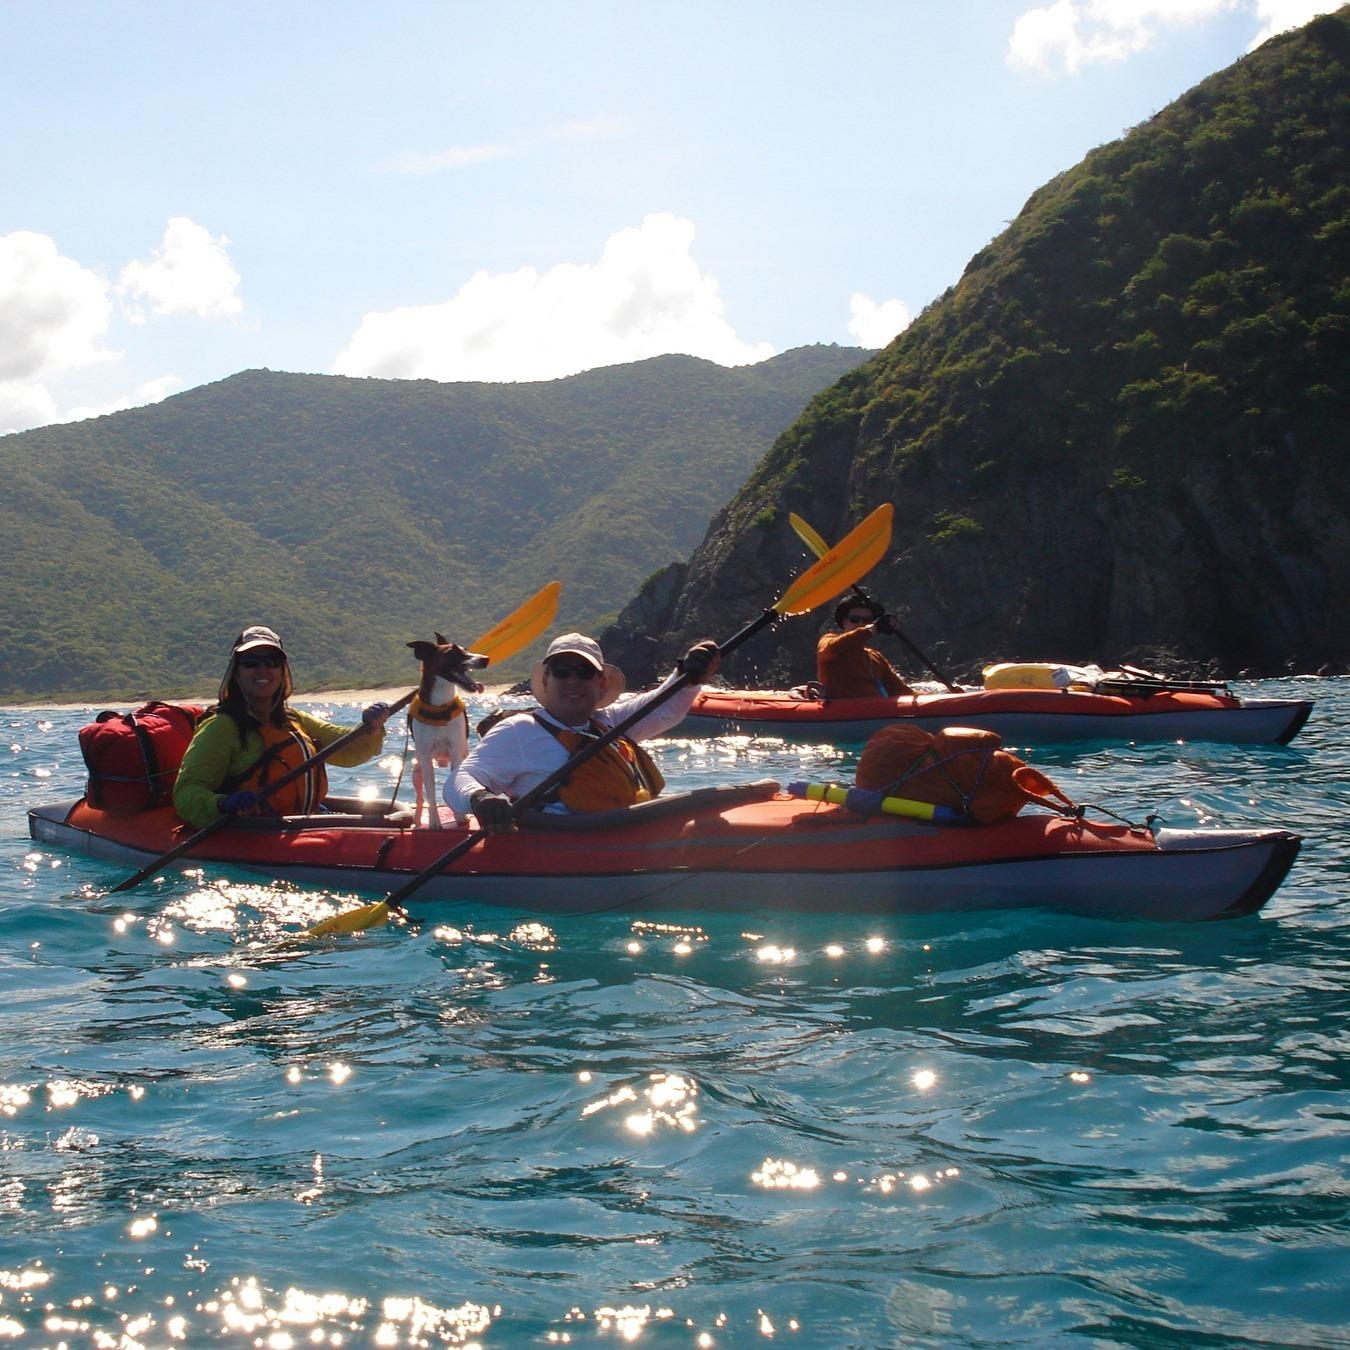 Expedition Touring Advancedframe® Convertible Elite inflatable kayak